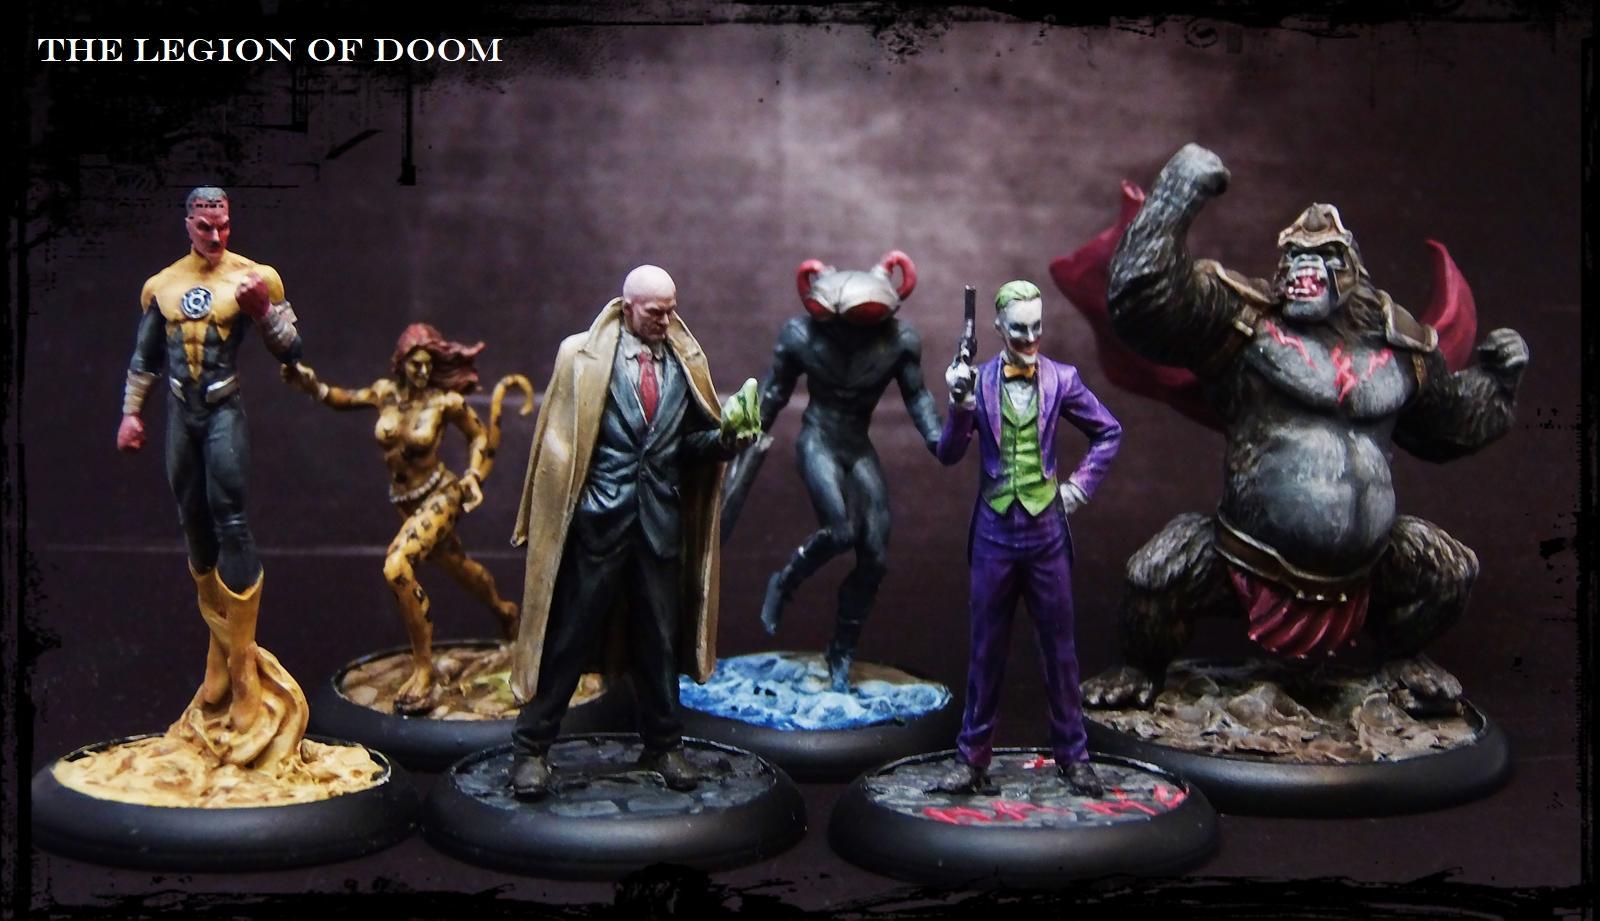 Comic, Dc, Justice League, Knight Models, Superheroes